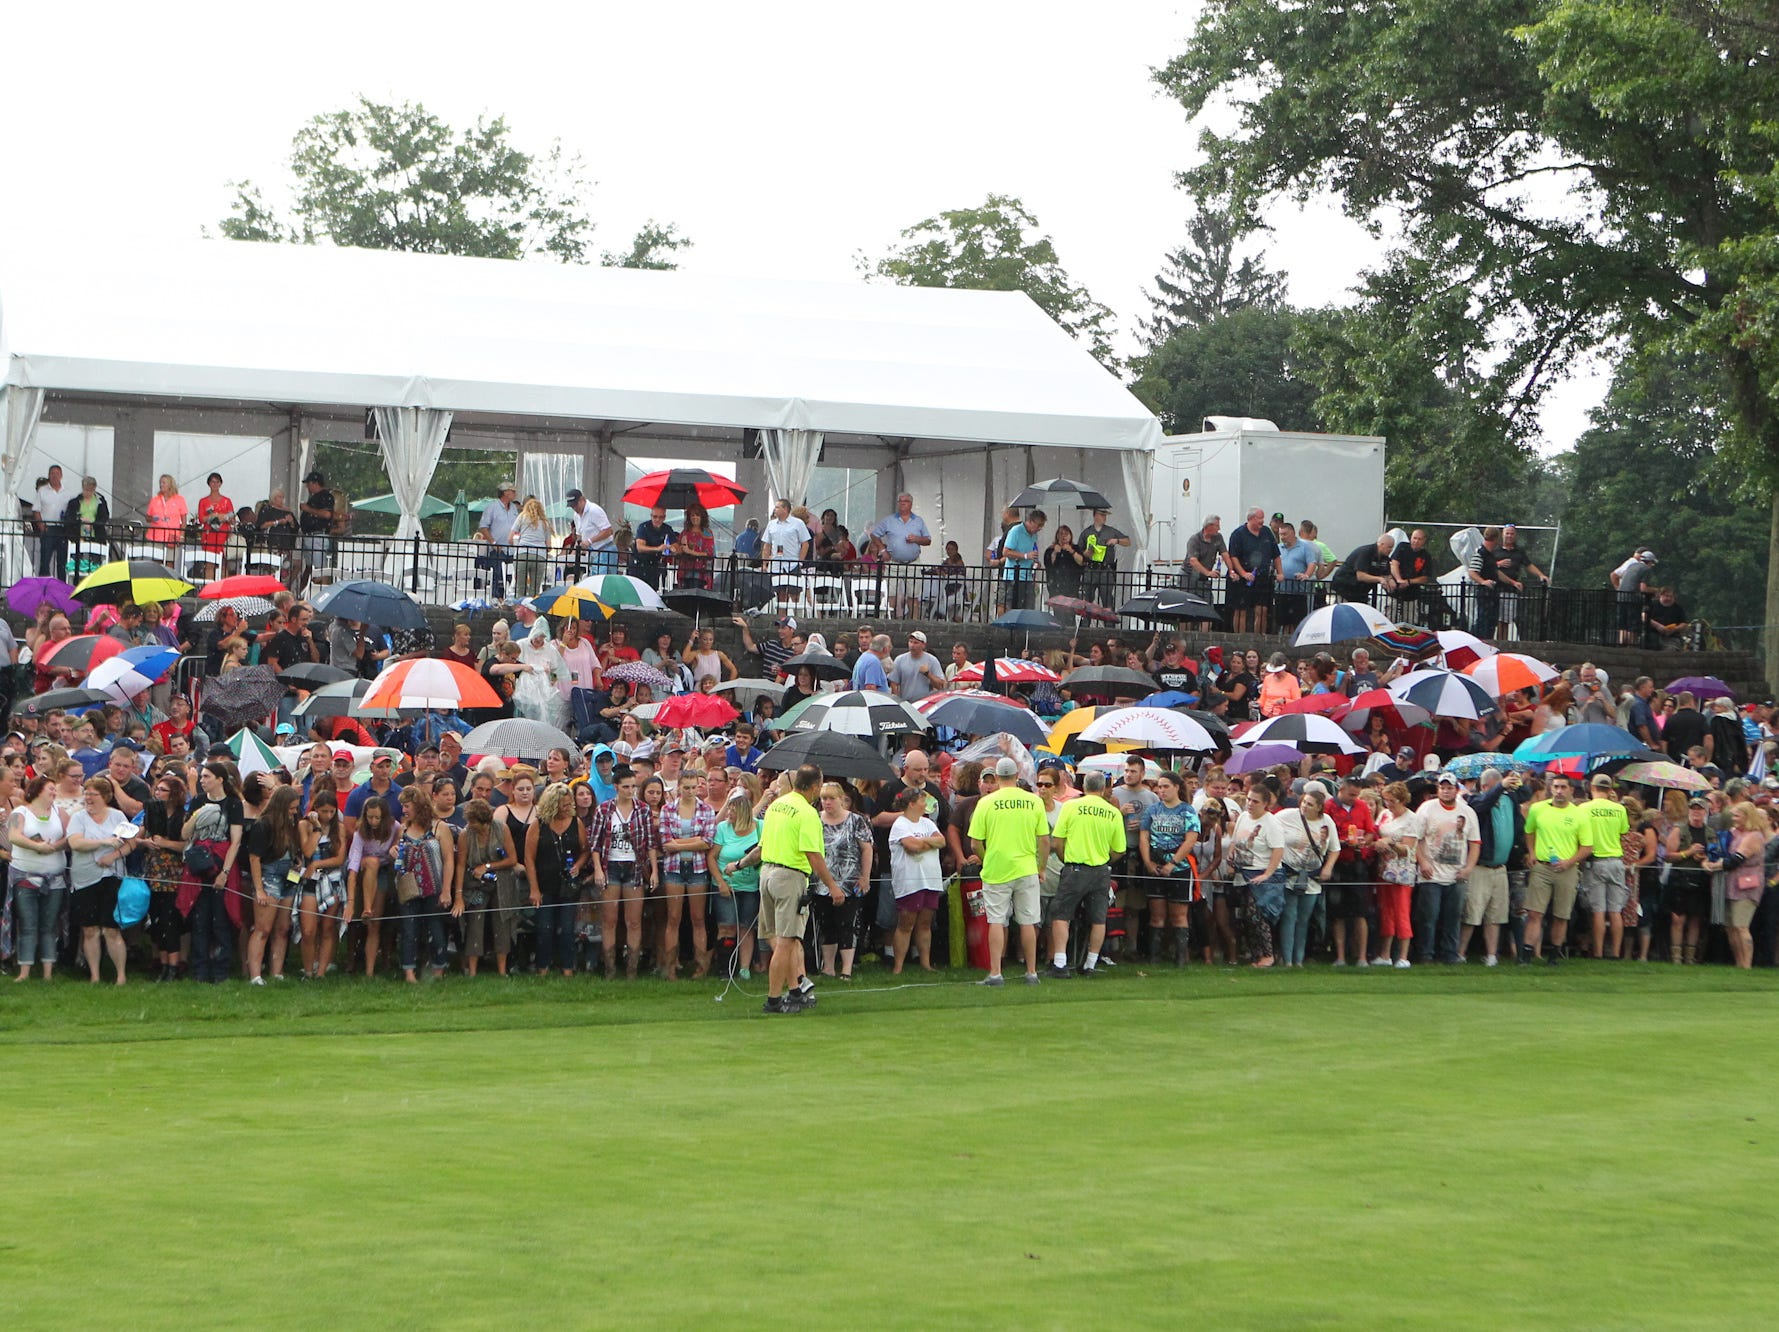 Umbrellas were the standard equipment at the Blake Shelton concert.